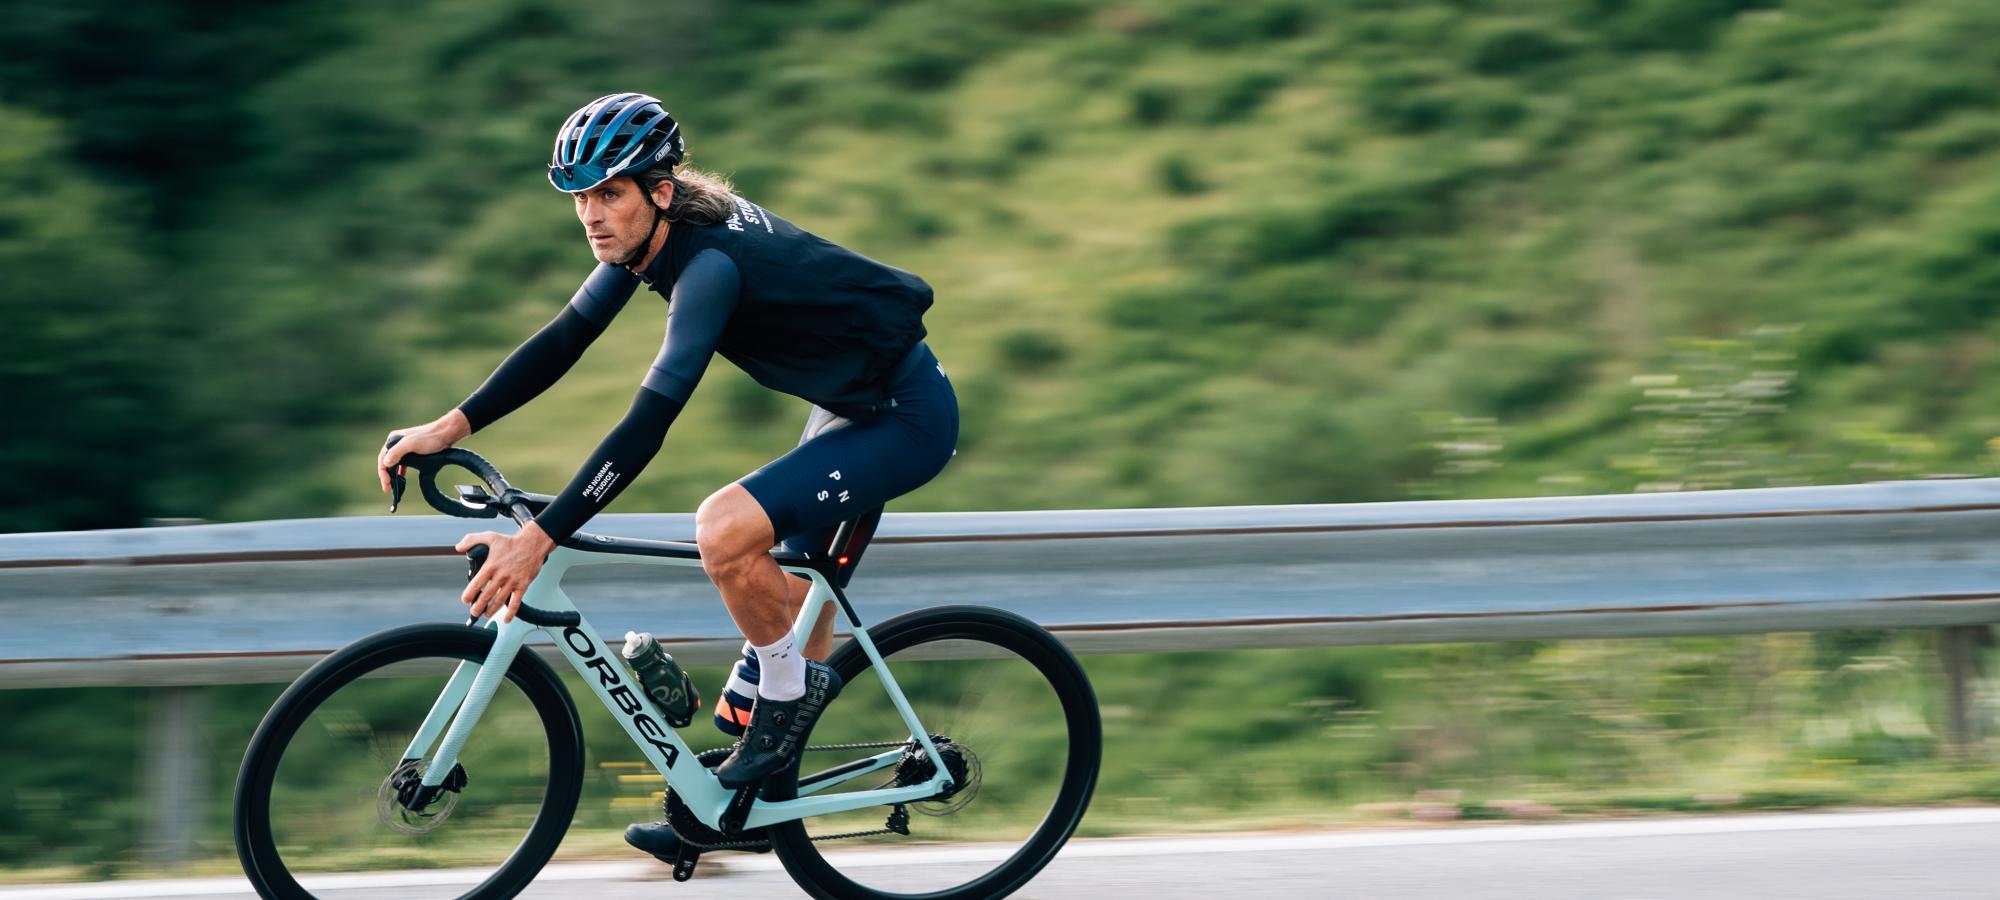 Orbea Bike's e-bikes pros and cons